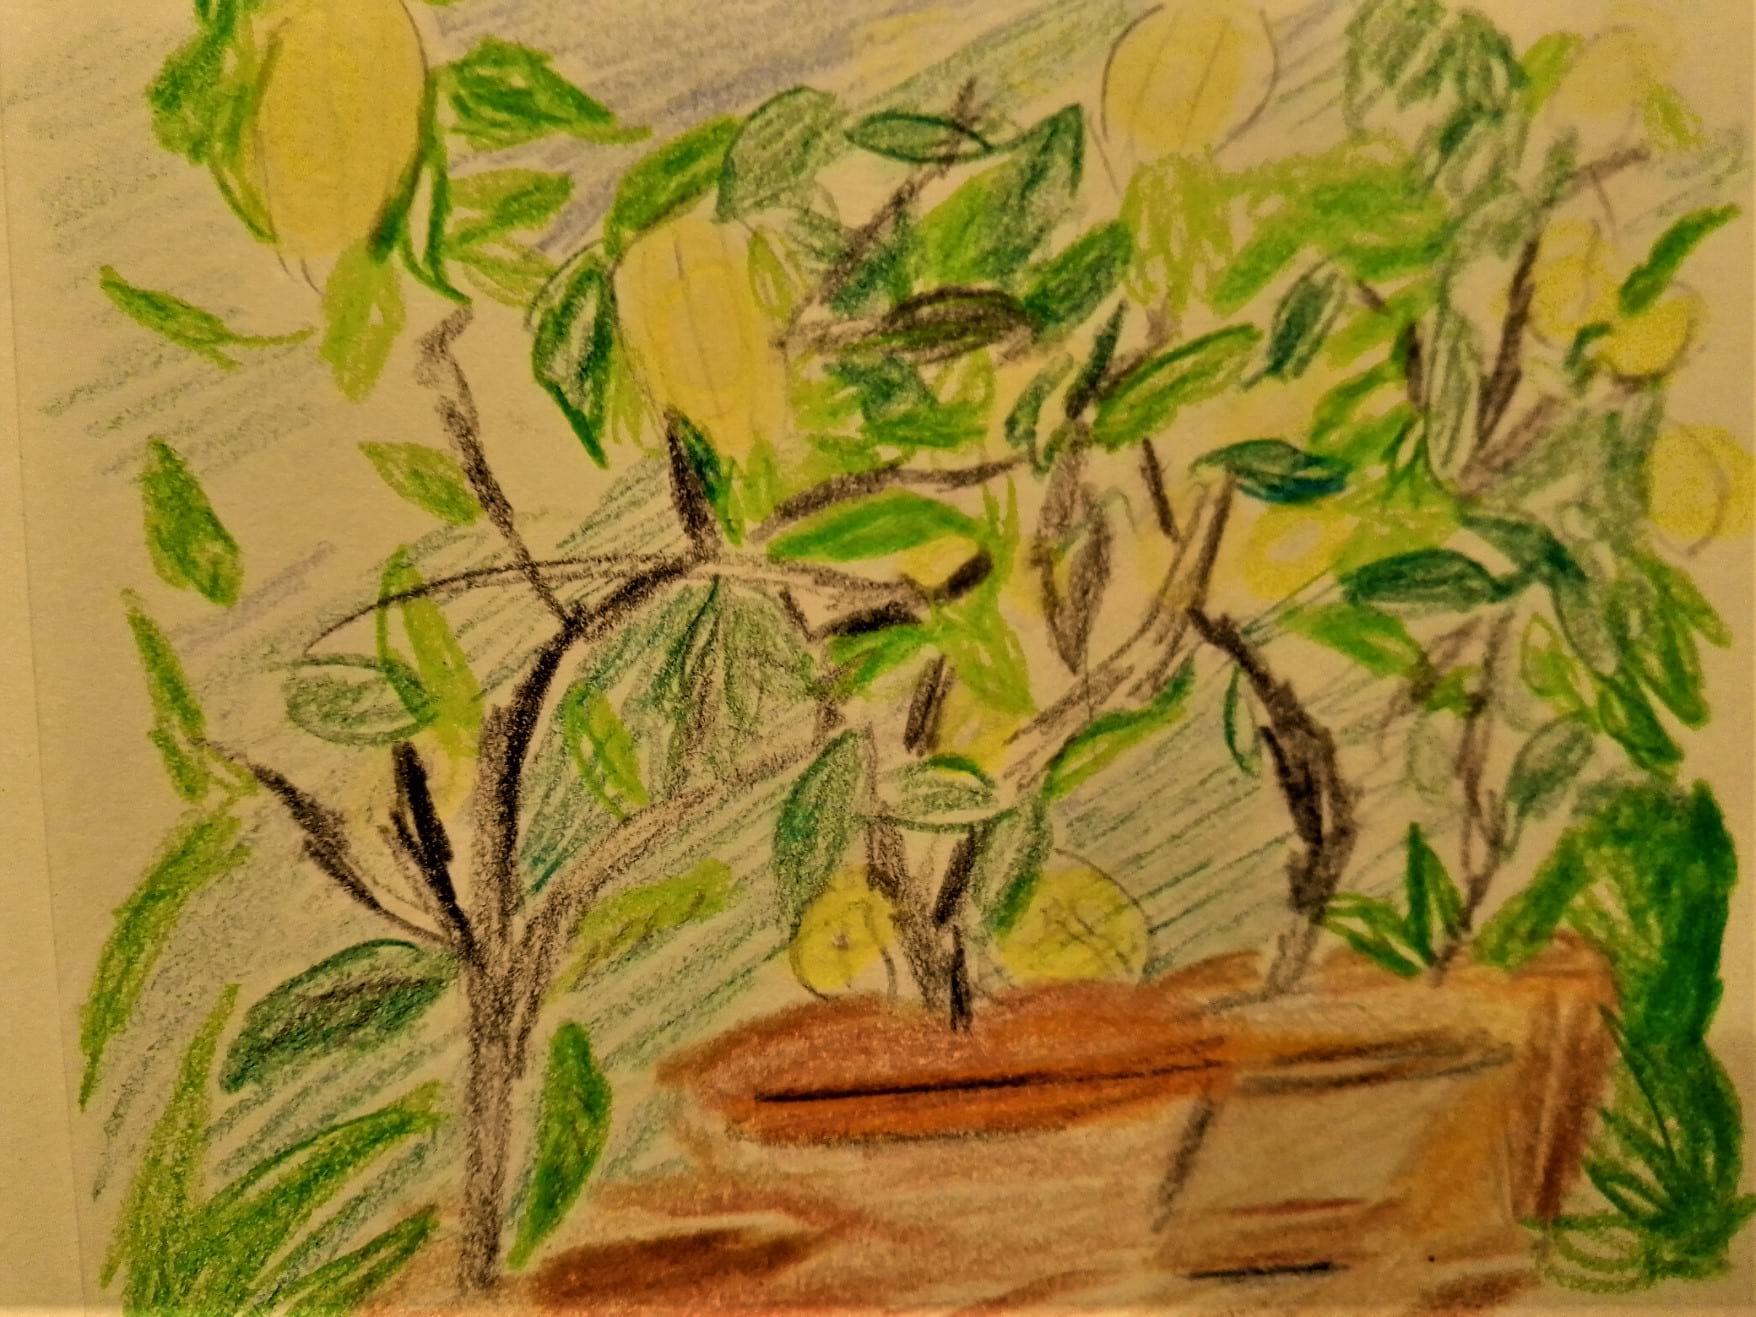 lemon plants observations